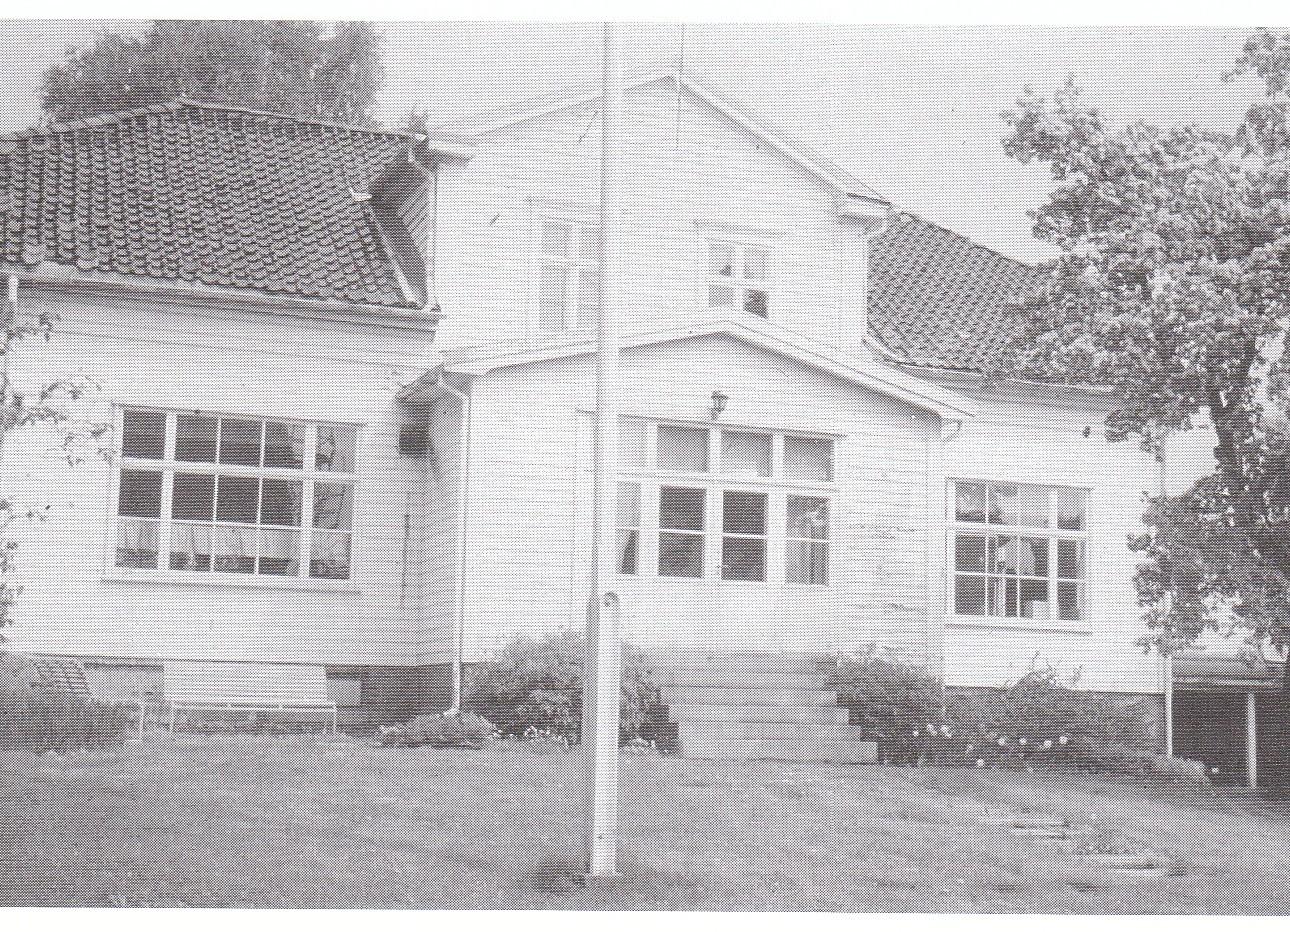 Gamle Bethelbilder (4)